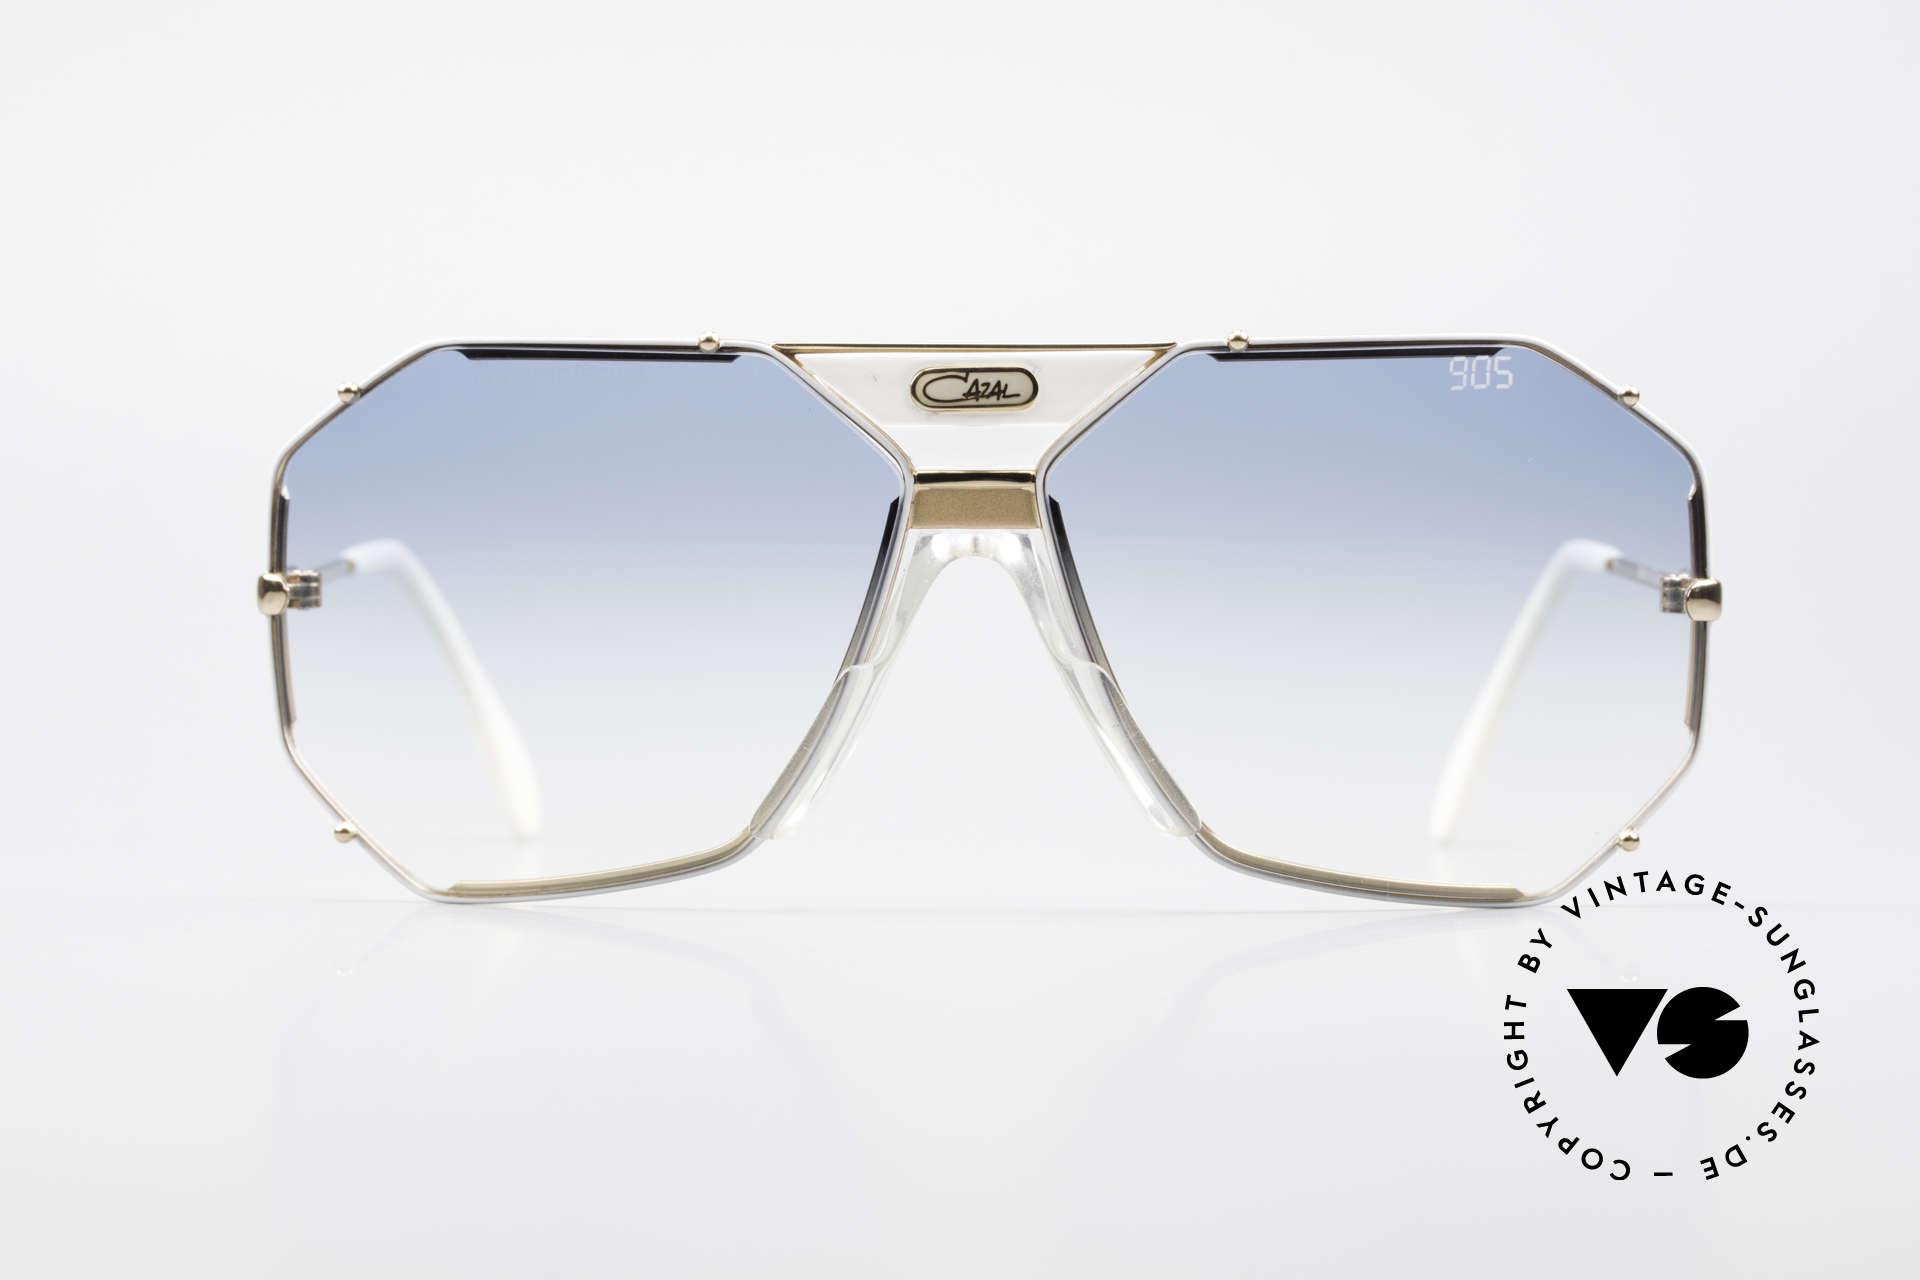 Cazal 905 Gwen Stefani Vintage Shades, elegant, angular design by Cari Zalloni (CAZAL), Made for Men and Women